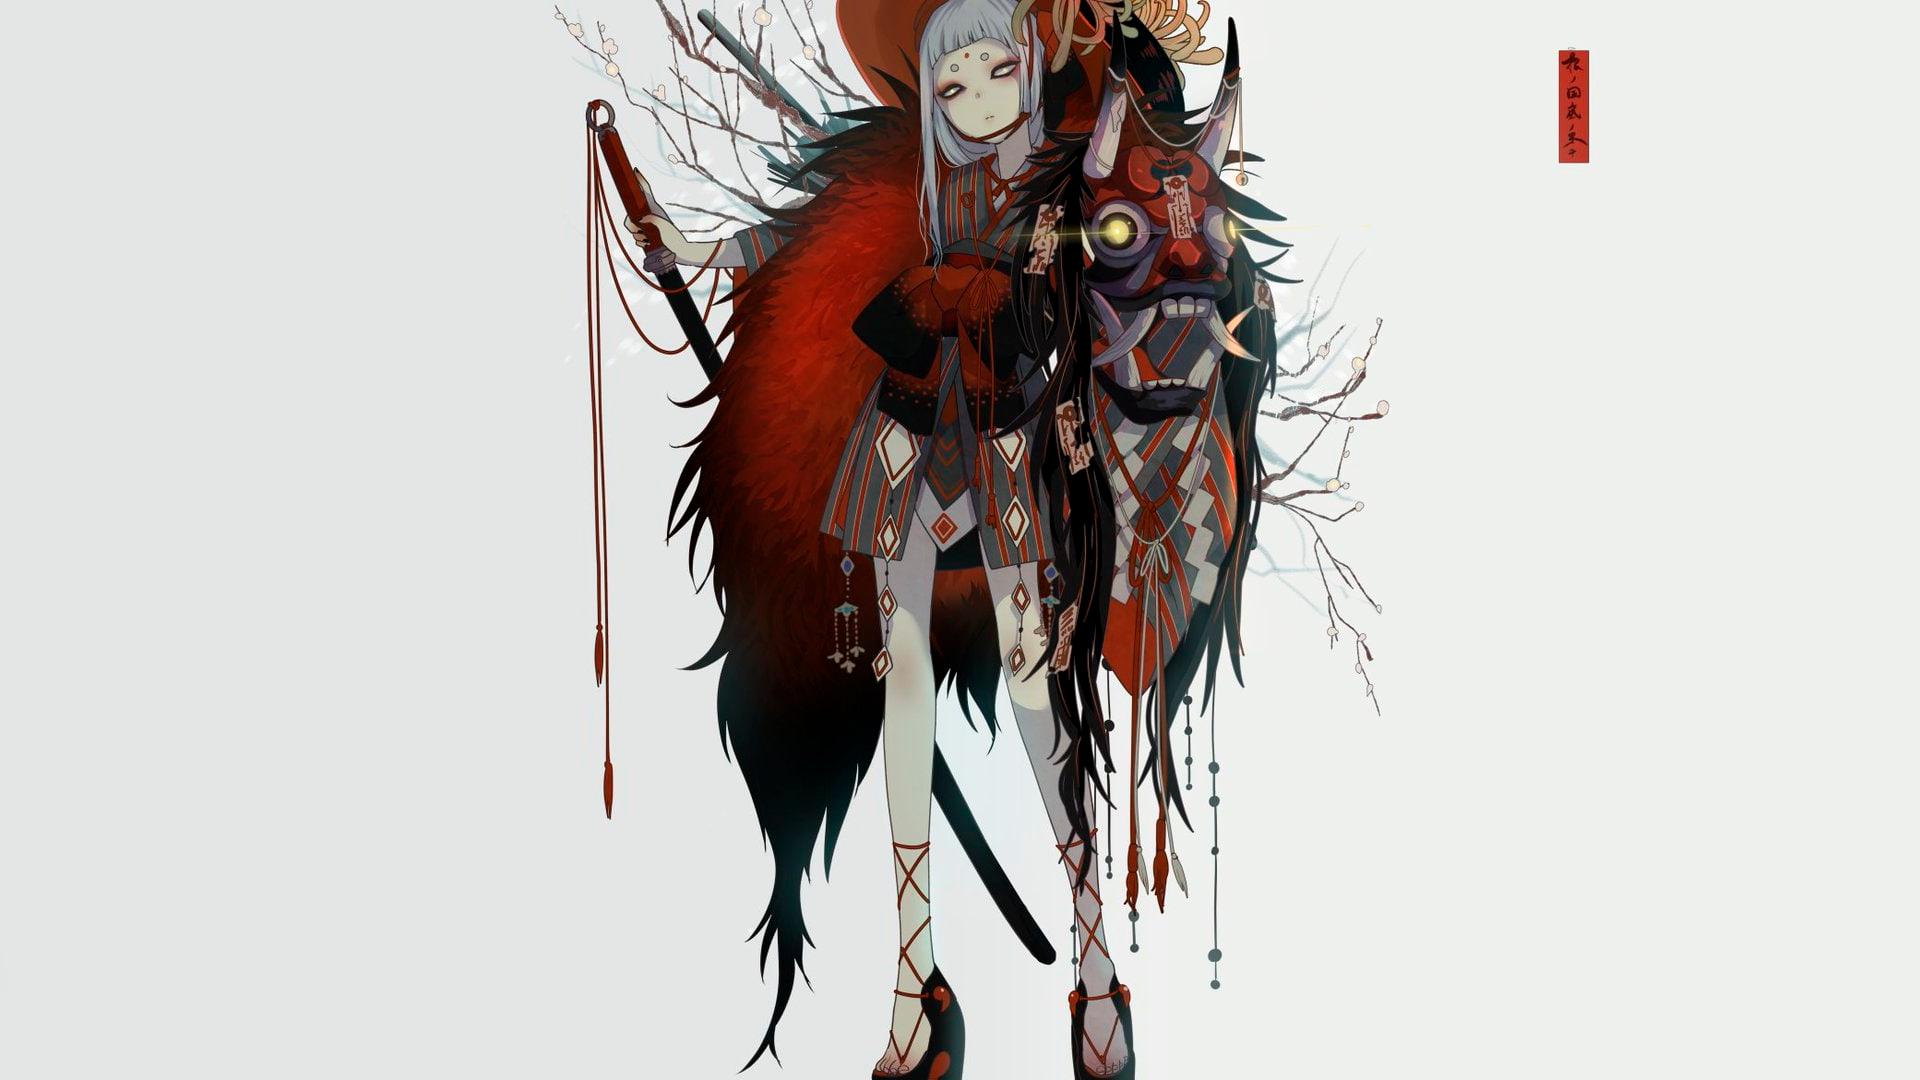 Anime 1920x1080 anime oni girl anime girls white background fantasy girl simple background